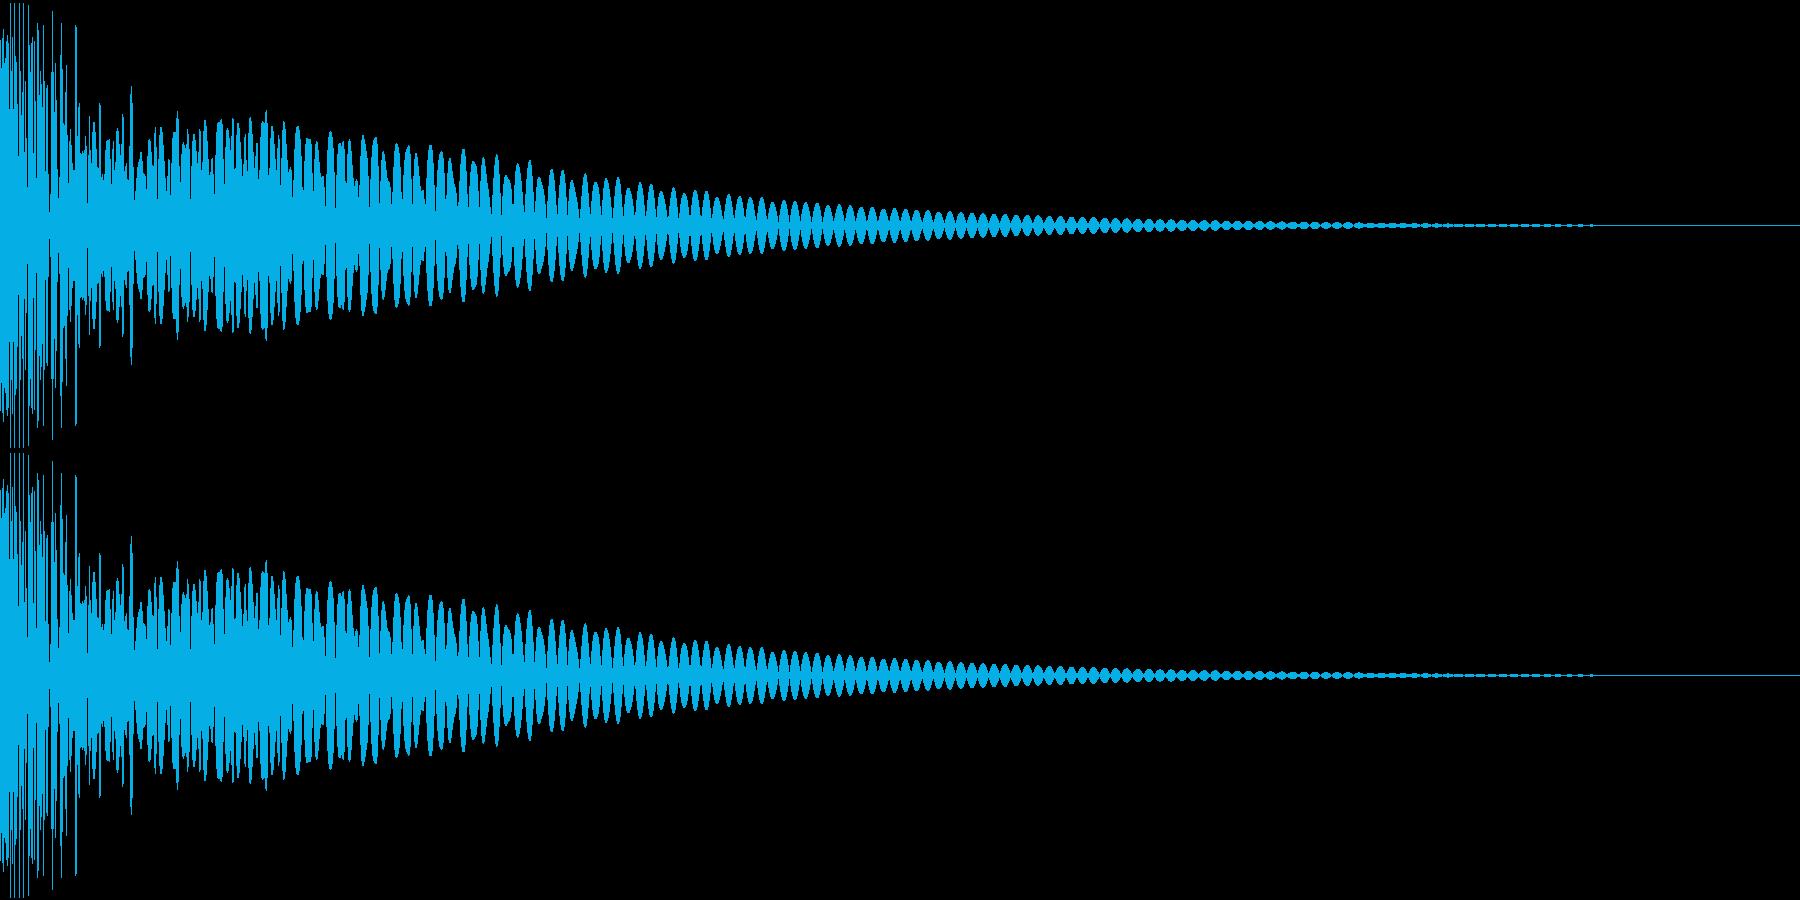 DTM Tom 31 オリジナル音源の再生済みの波形